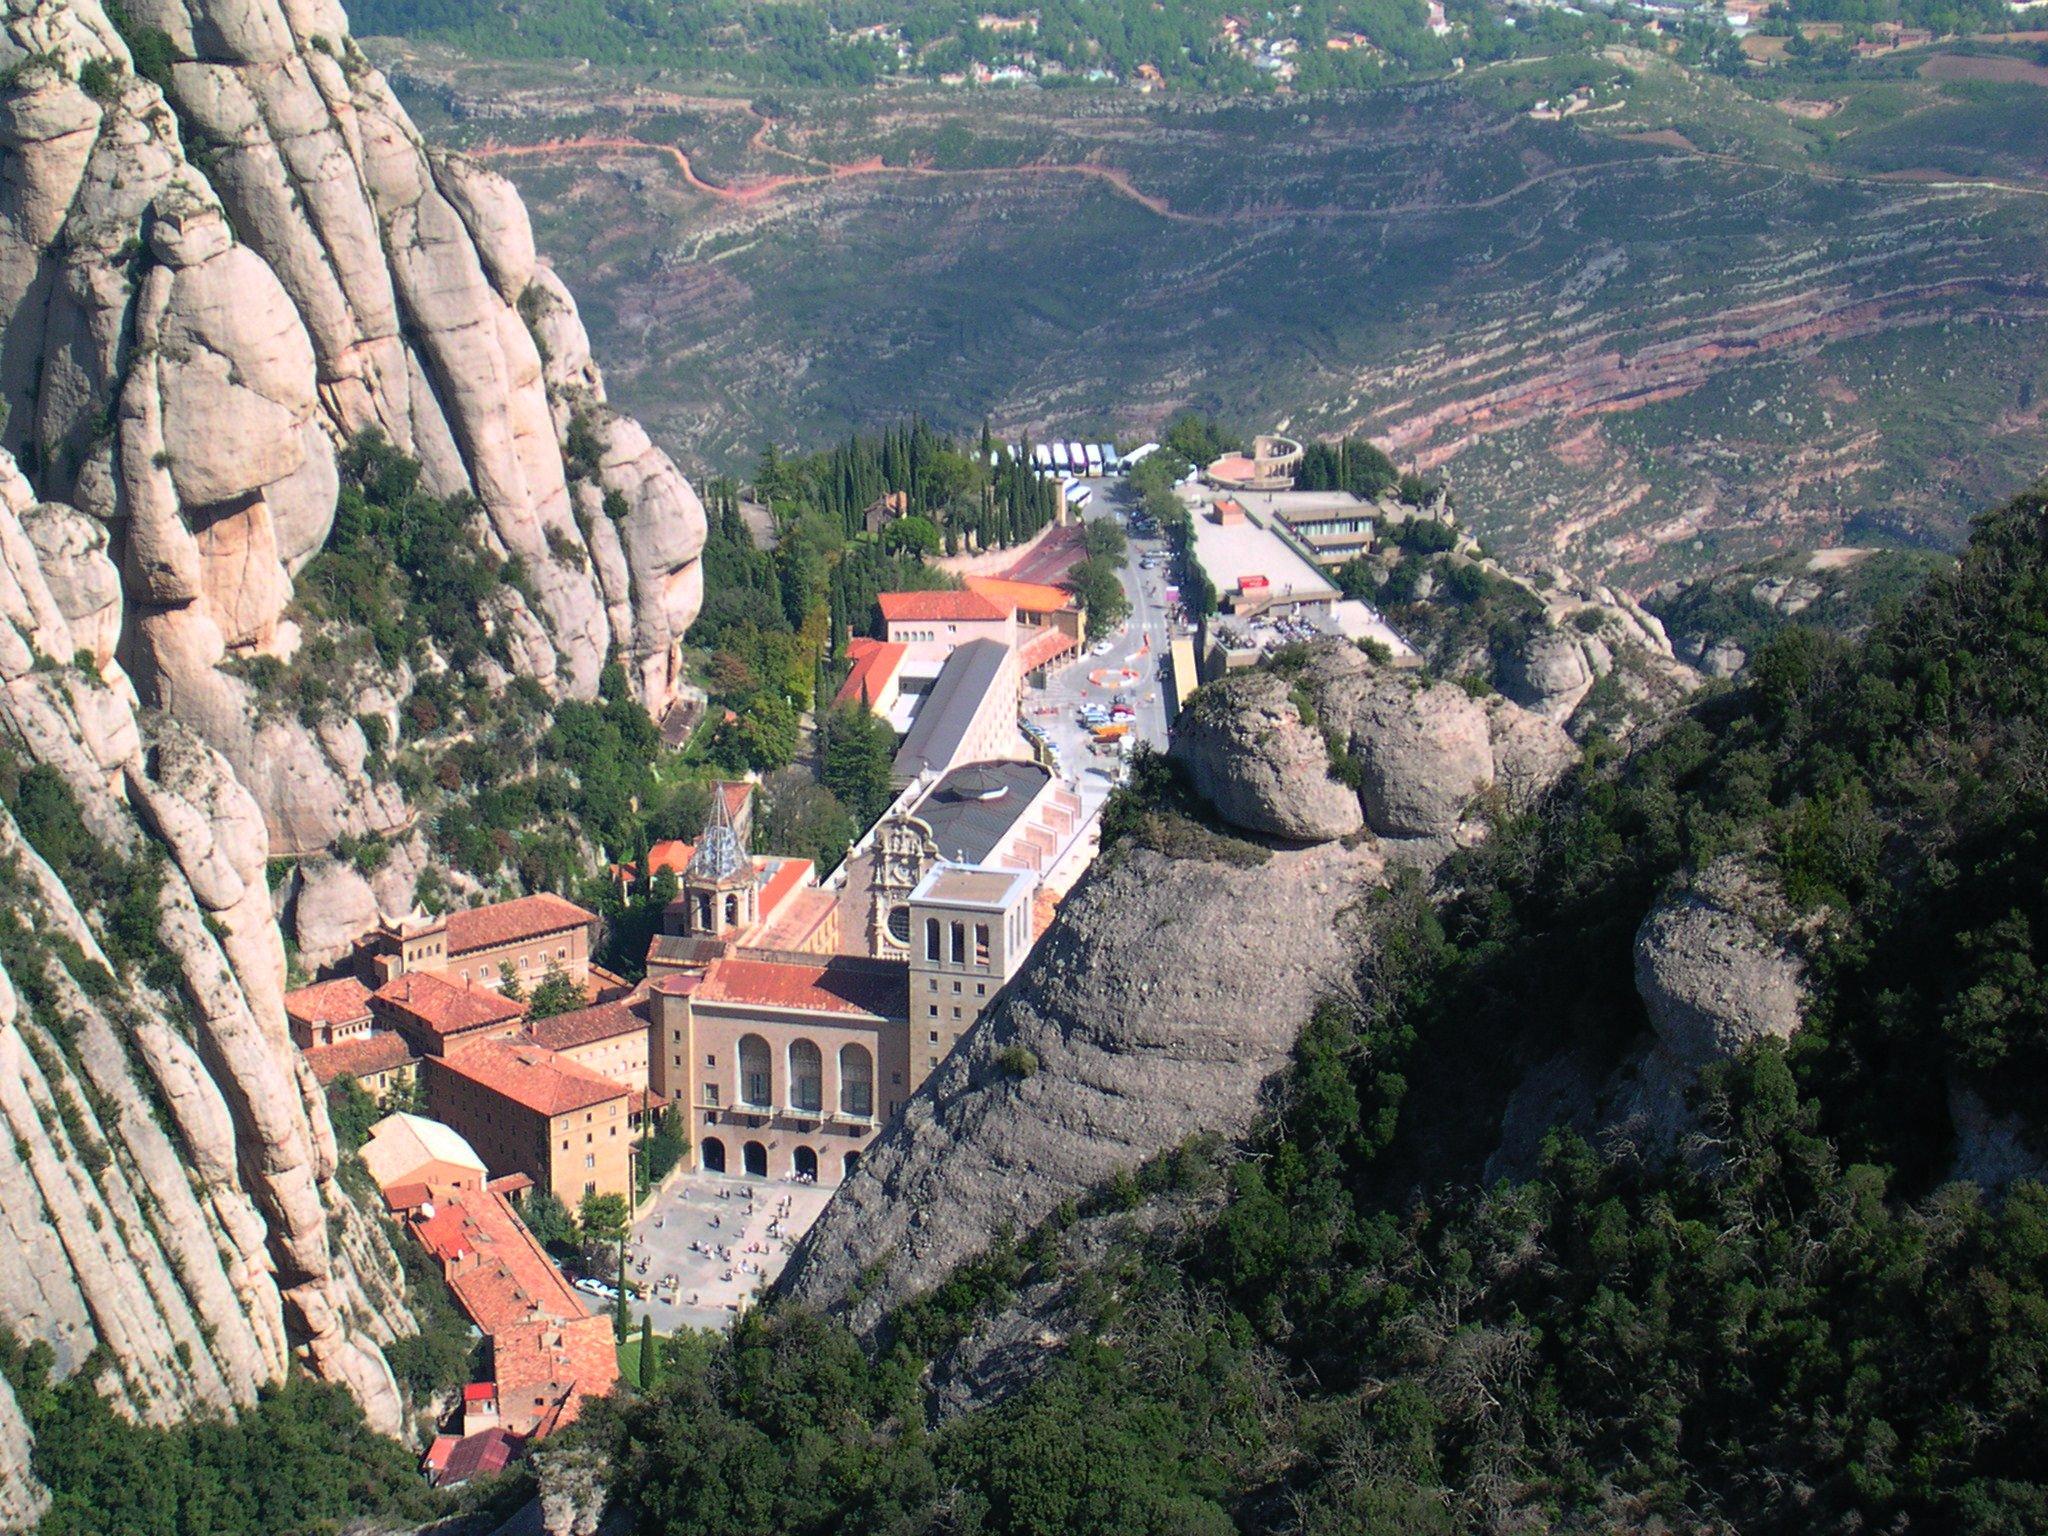 Monasterio Monserrat (Fto Richard Schneider - Wikicommos)